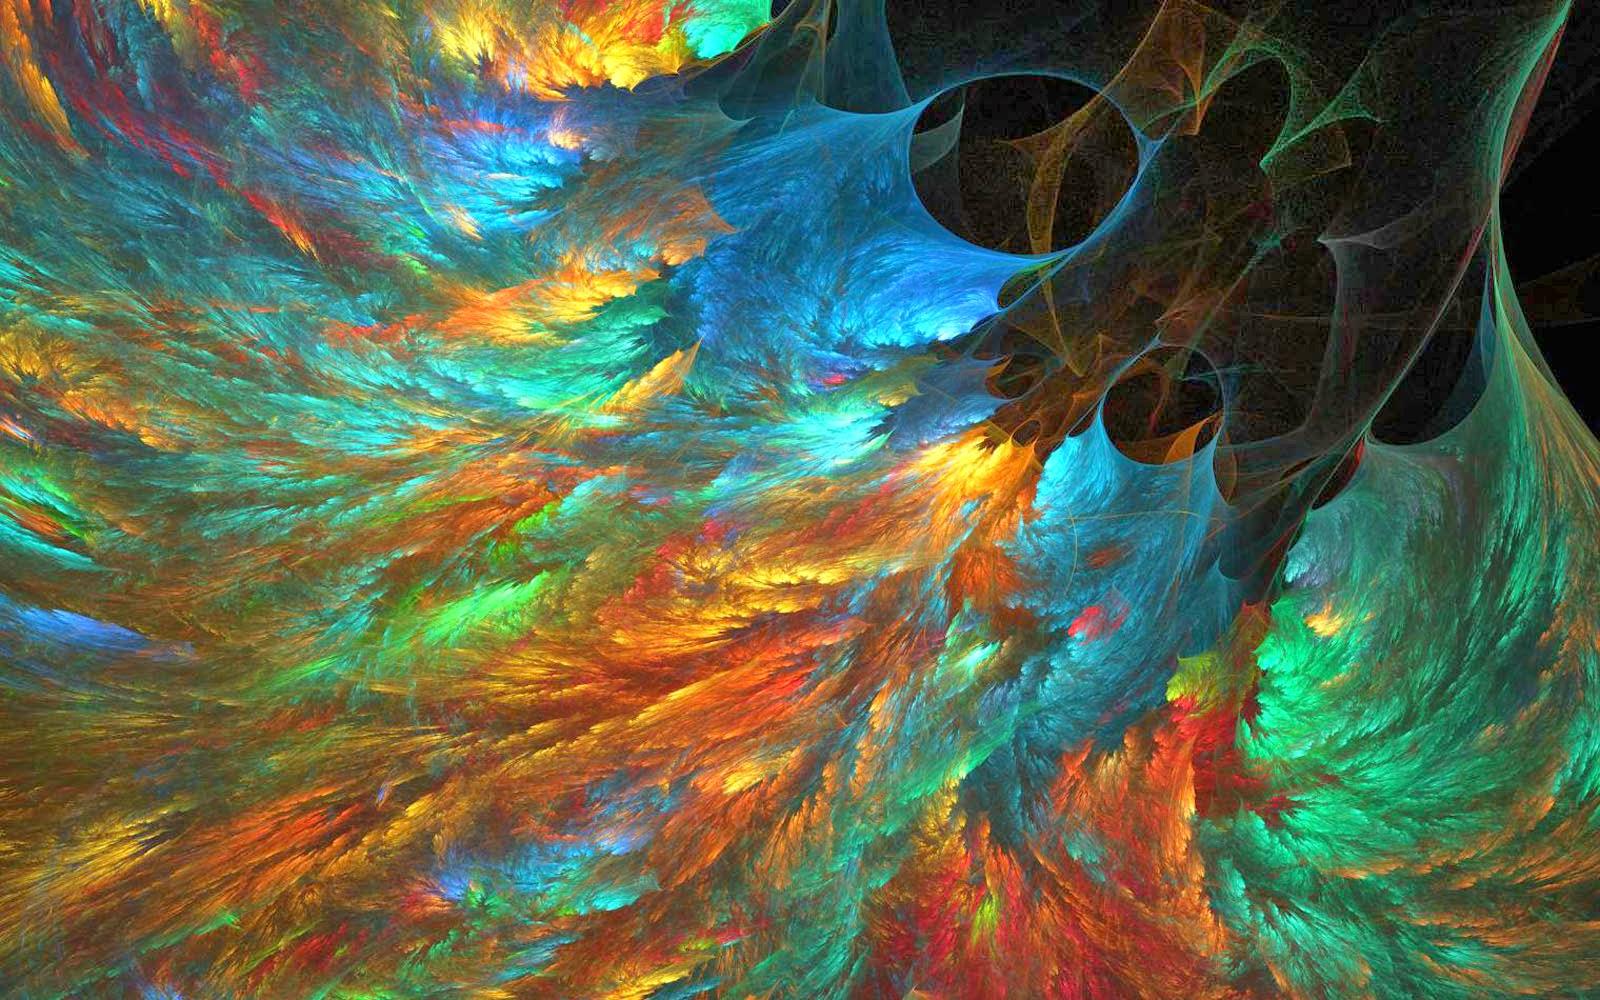 abstract art wallpaper hd,fractal art,art,orange,water,painting